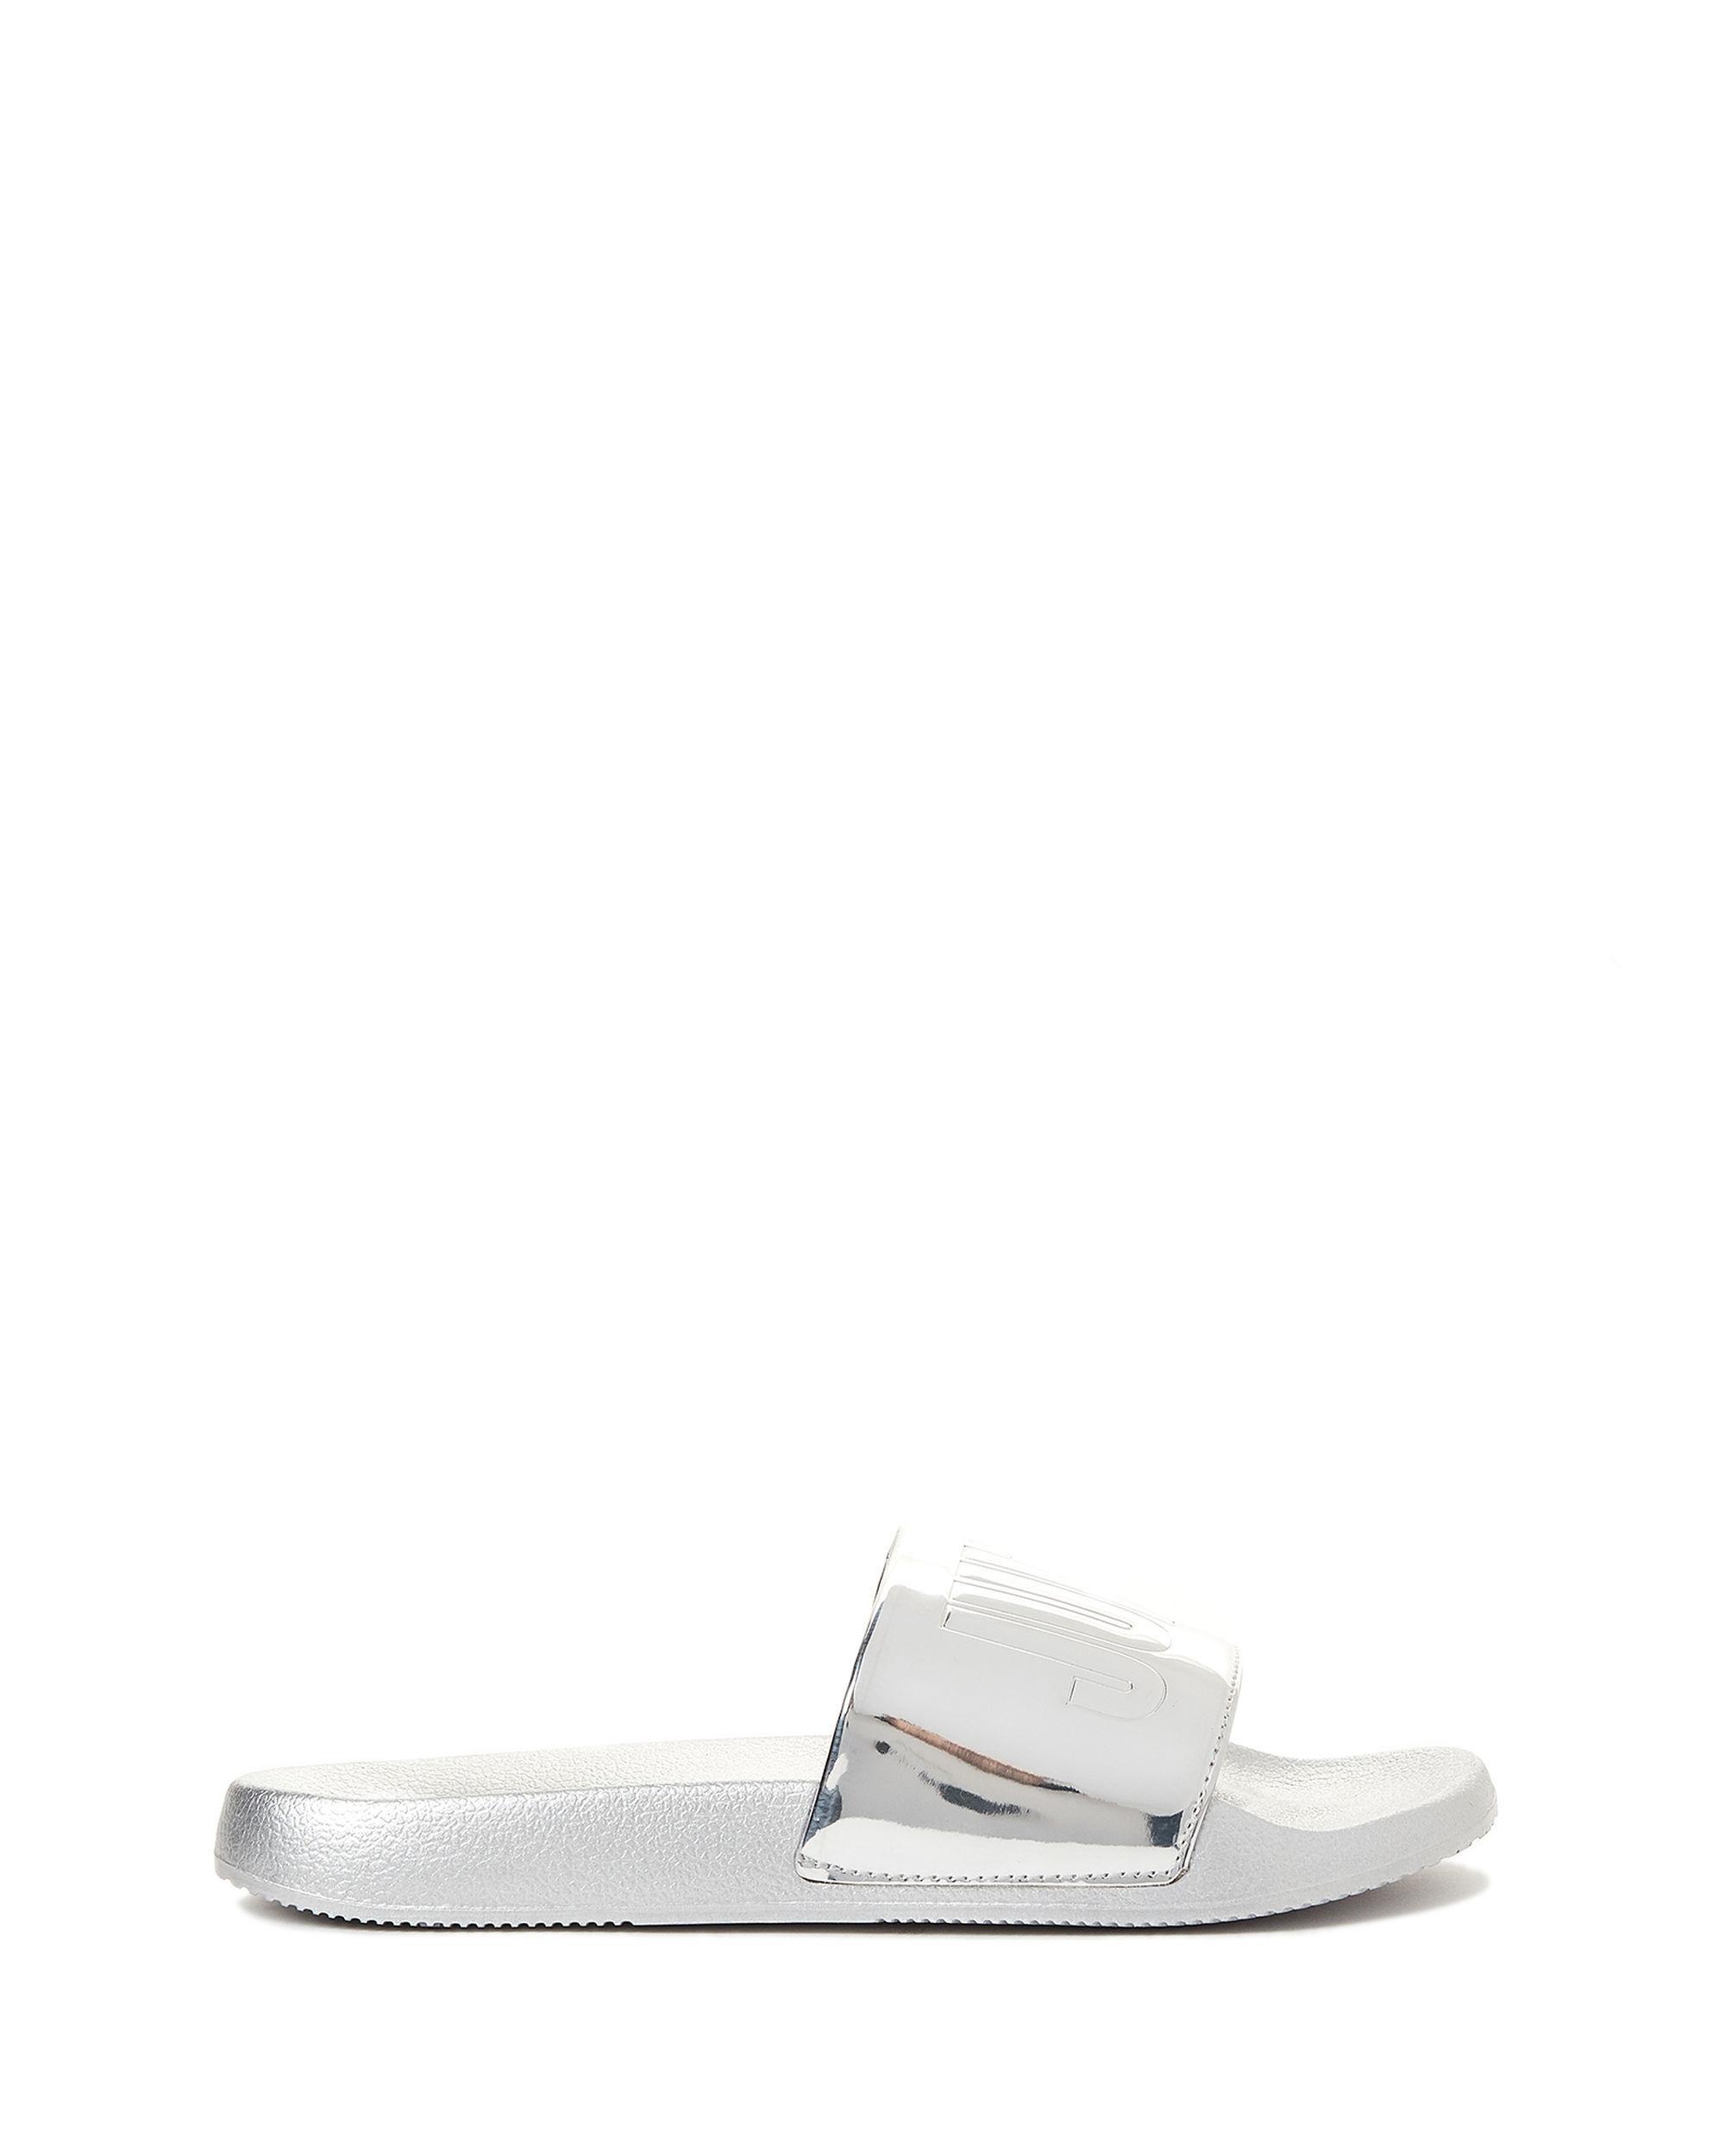 0c731d132bd1 Lyst - Juicy Couture Silver Logo Slide Sandals in Metallic